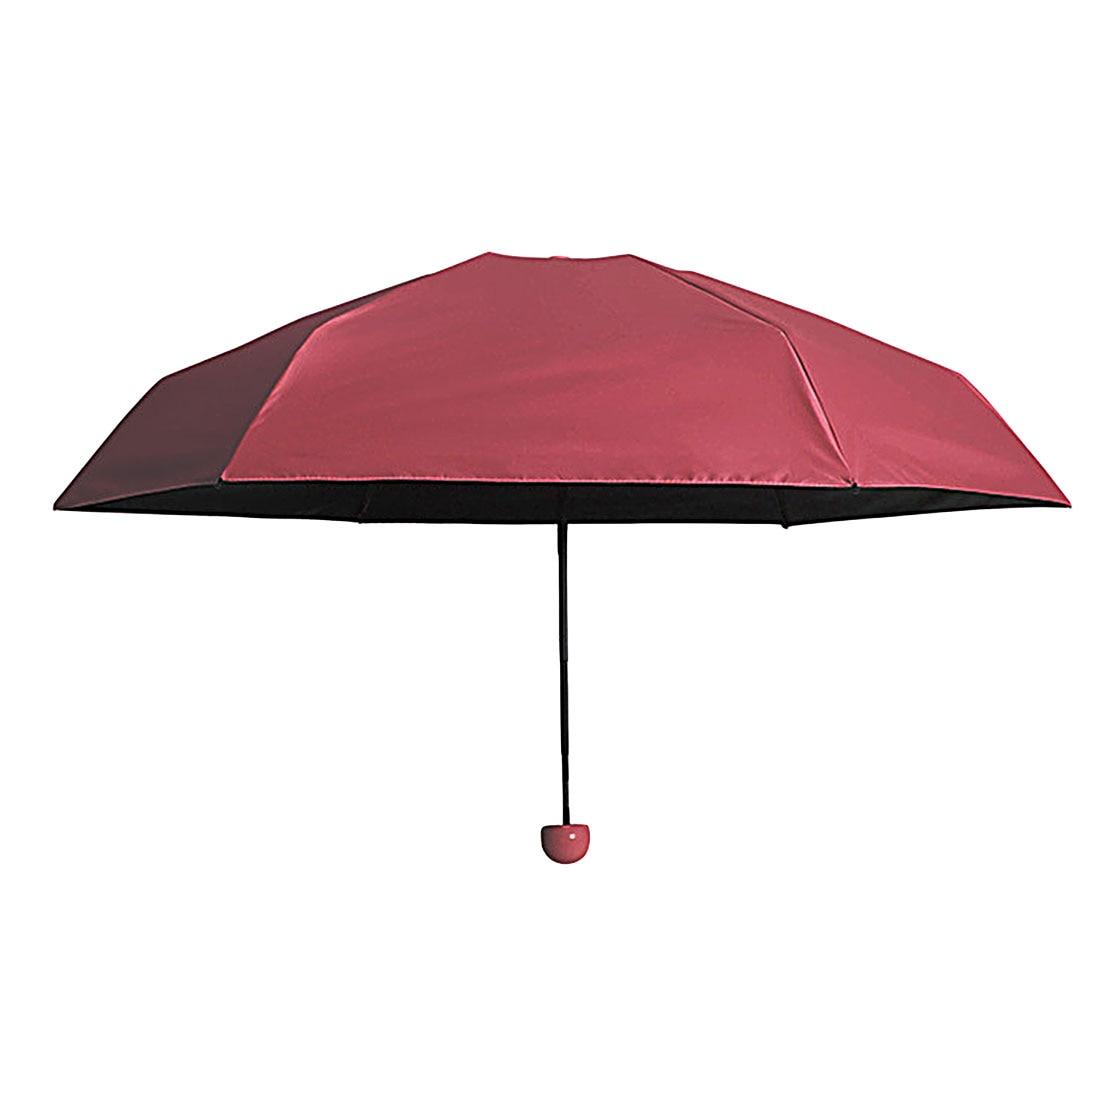 Jasne parasole Jasne parasole new picture